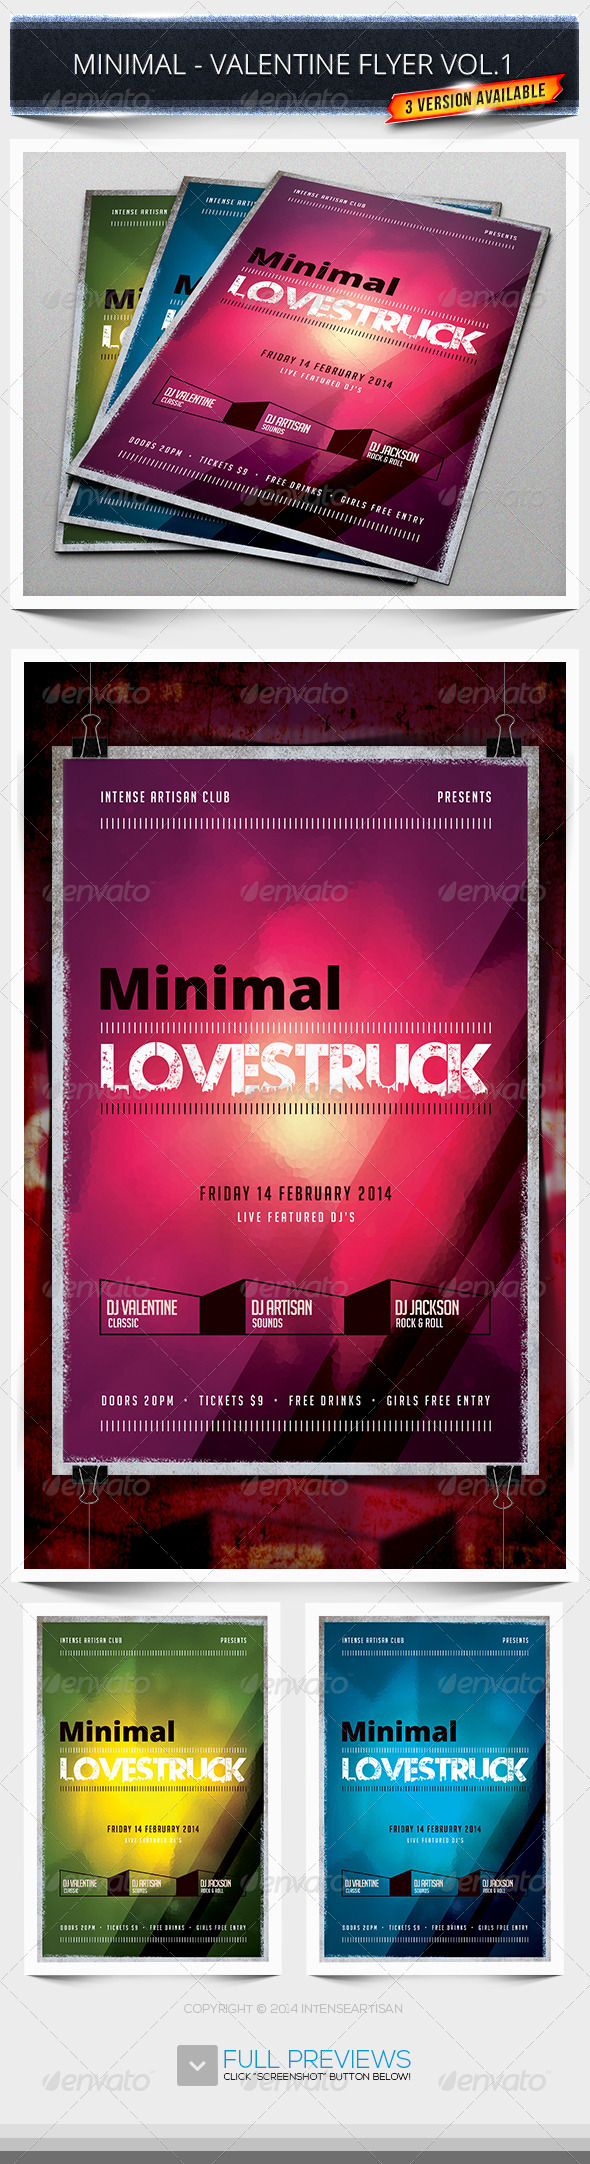 Minimal - Valentine Flyer Vol.1 - Holidays Events